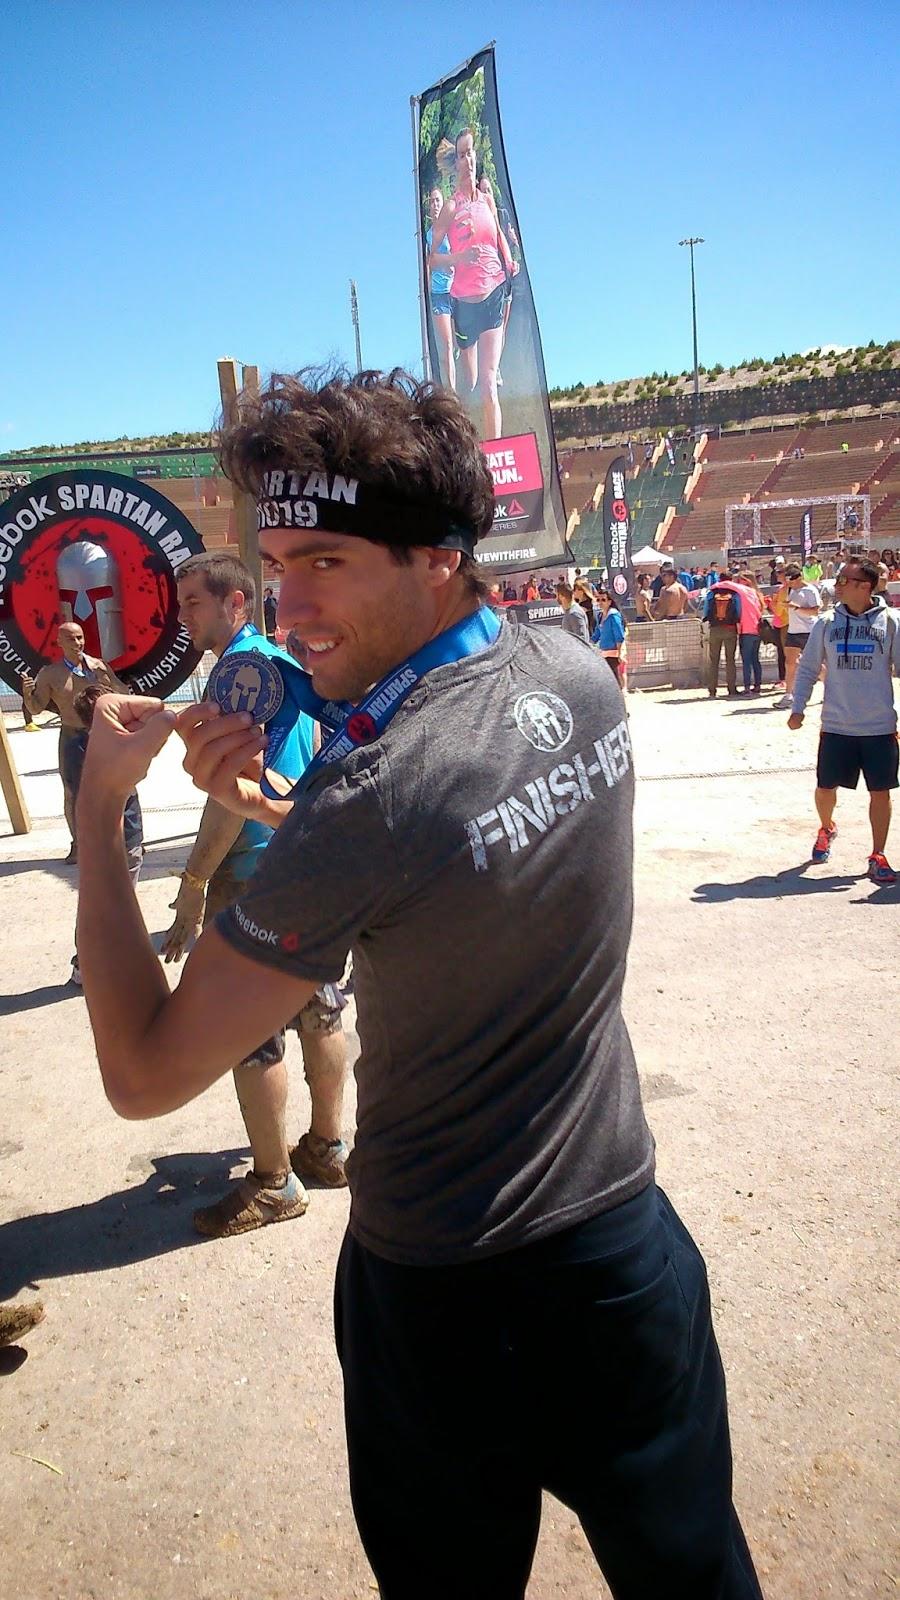 spartan race madrid españa fotos medalla